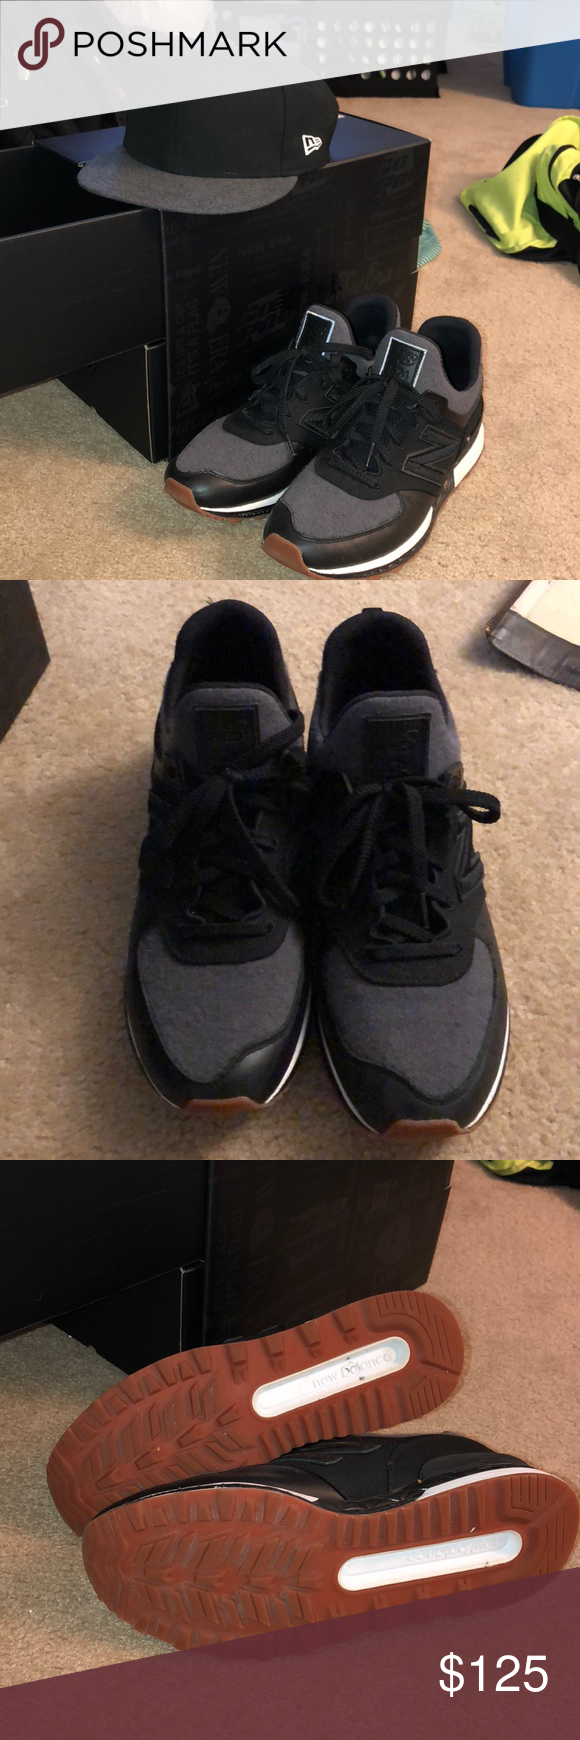 sports shoes 32945 db694 New Balance x New Era 574 Sport Sneakers worn a few times ...